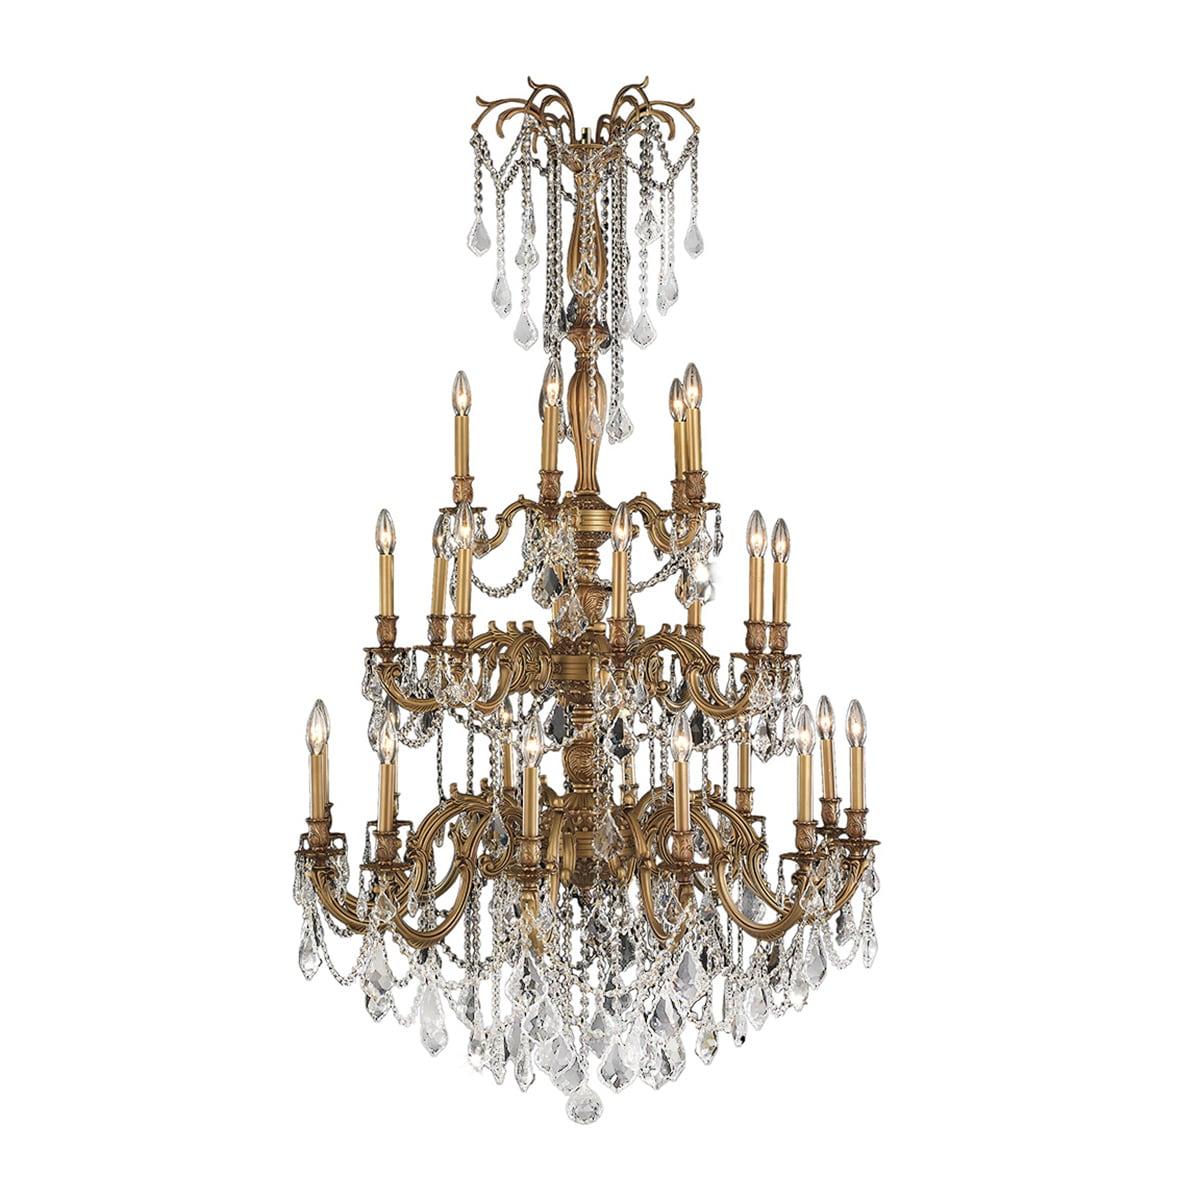 ornate lighting. Italian Elegance Collection 25 Light French Gold Finish Crystal Chandelier Ornate 38\ Lighting